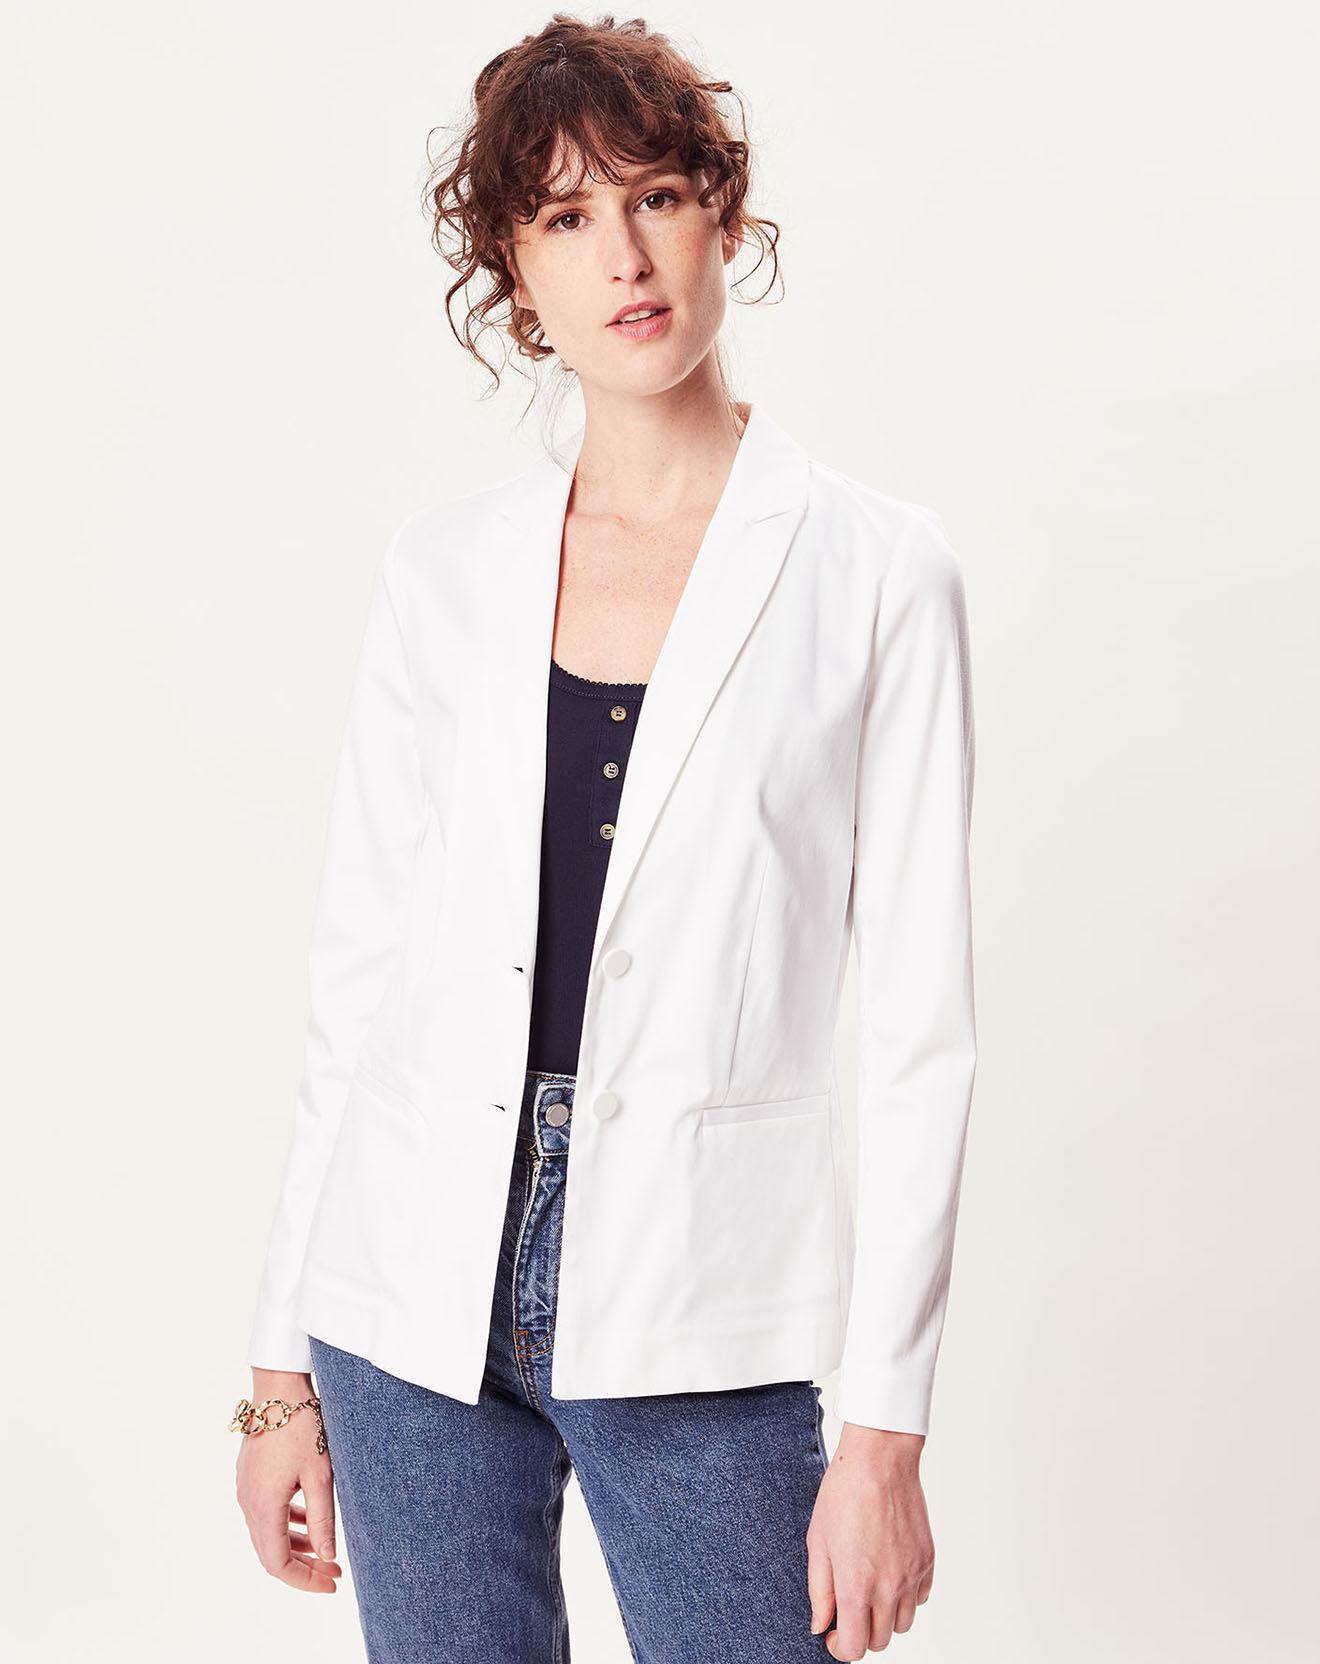 Veste tailleur E-Facile blanche - Naf Naf - Modalova